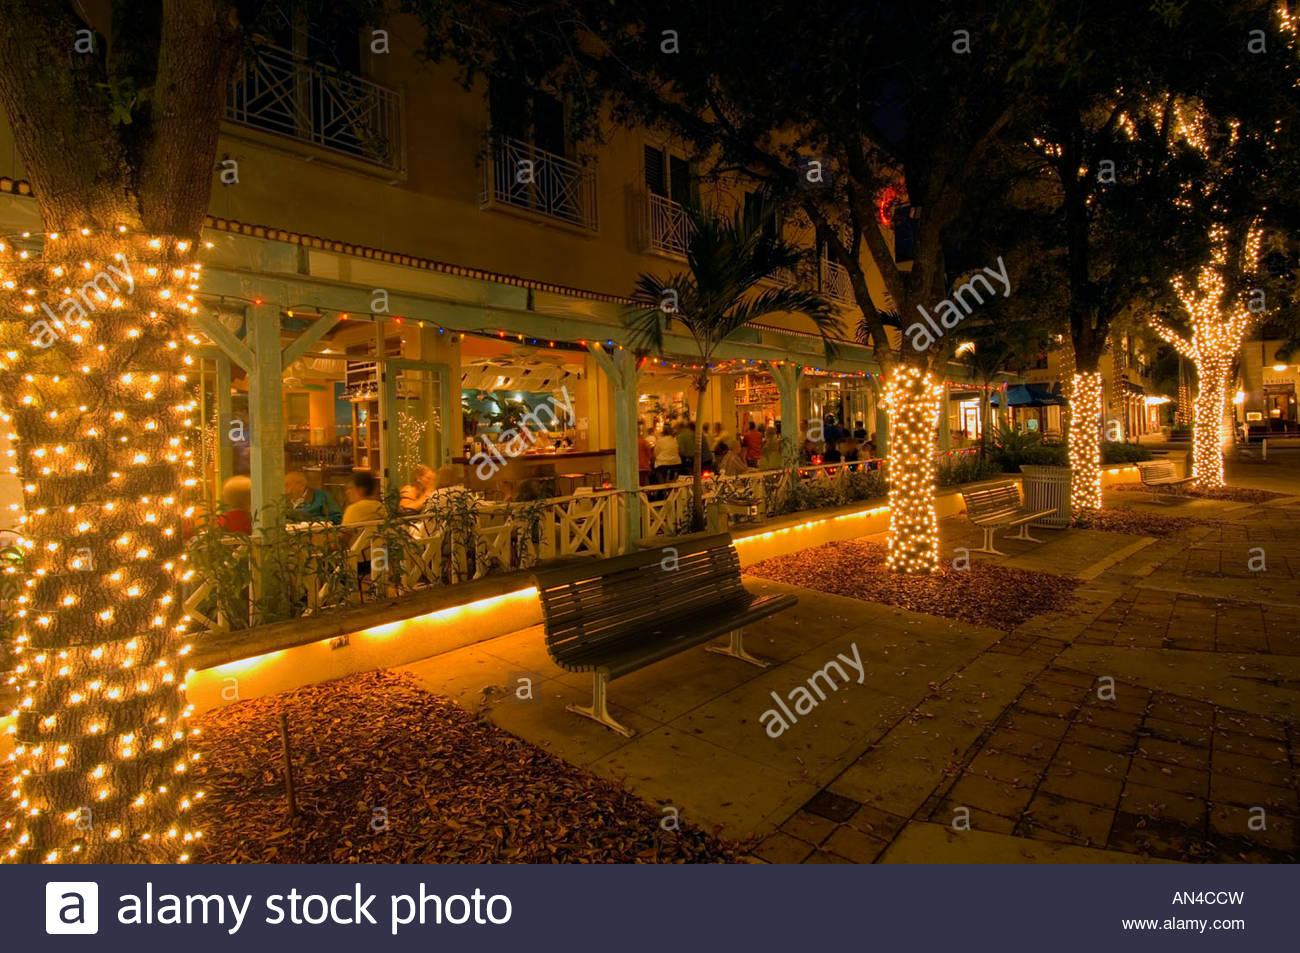 Florida Naples 5th Avenue Restaurant At Night Stock Photo